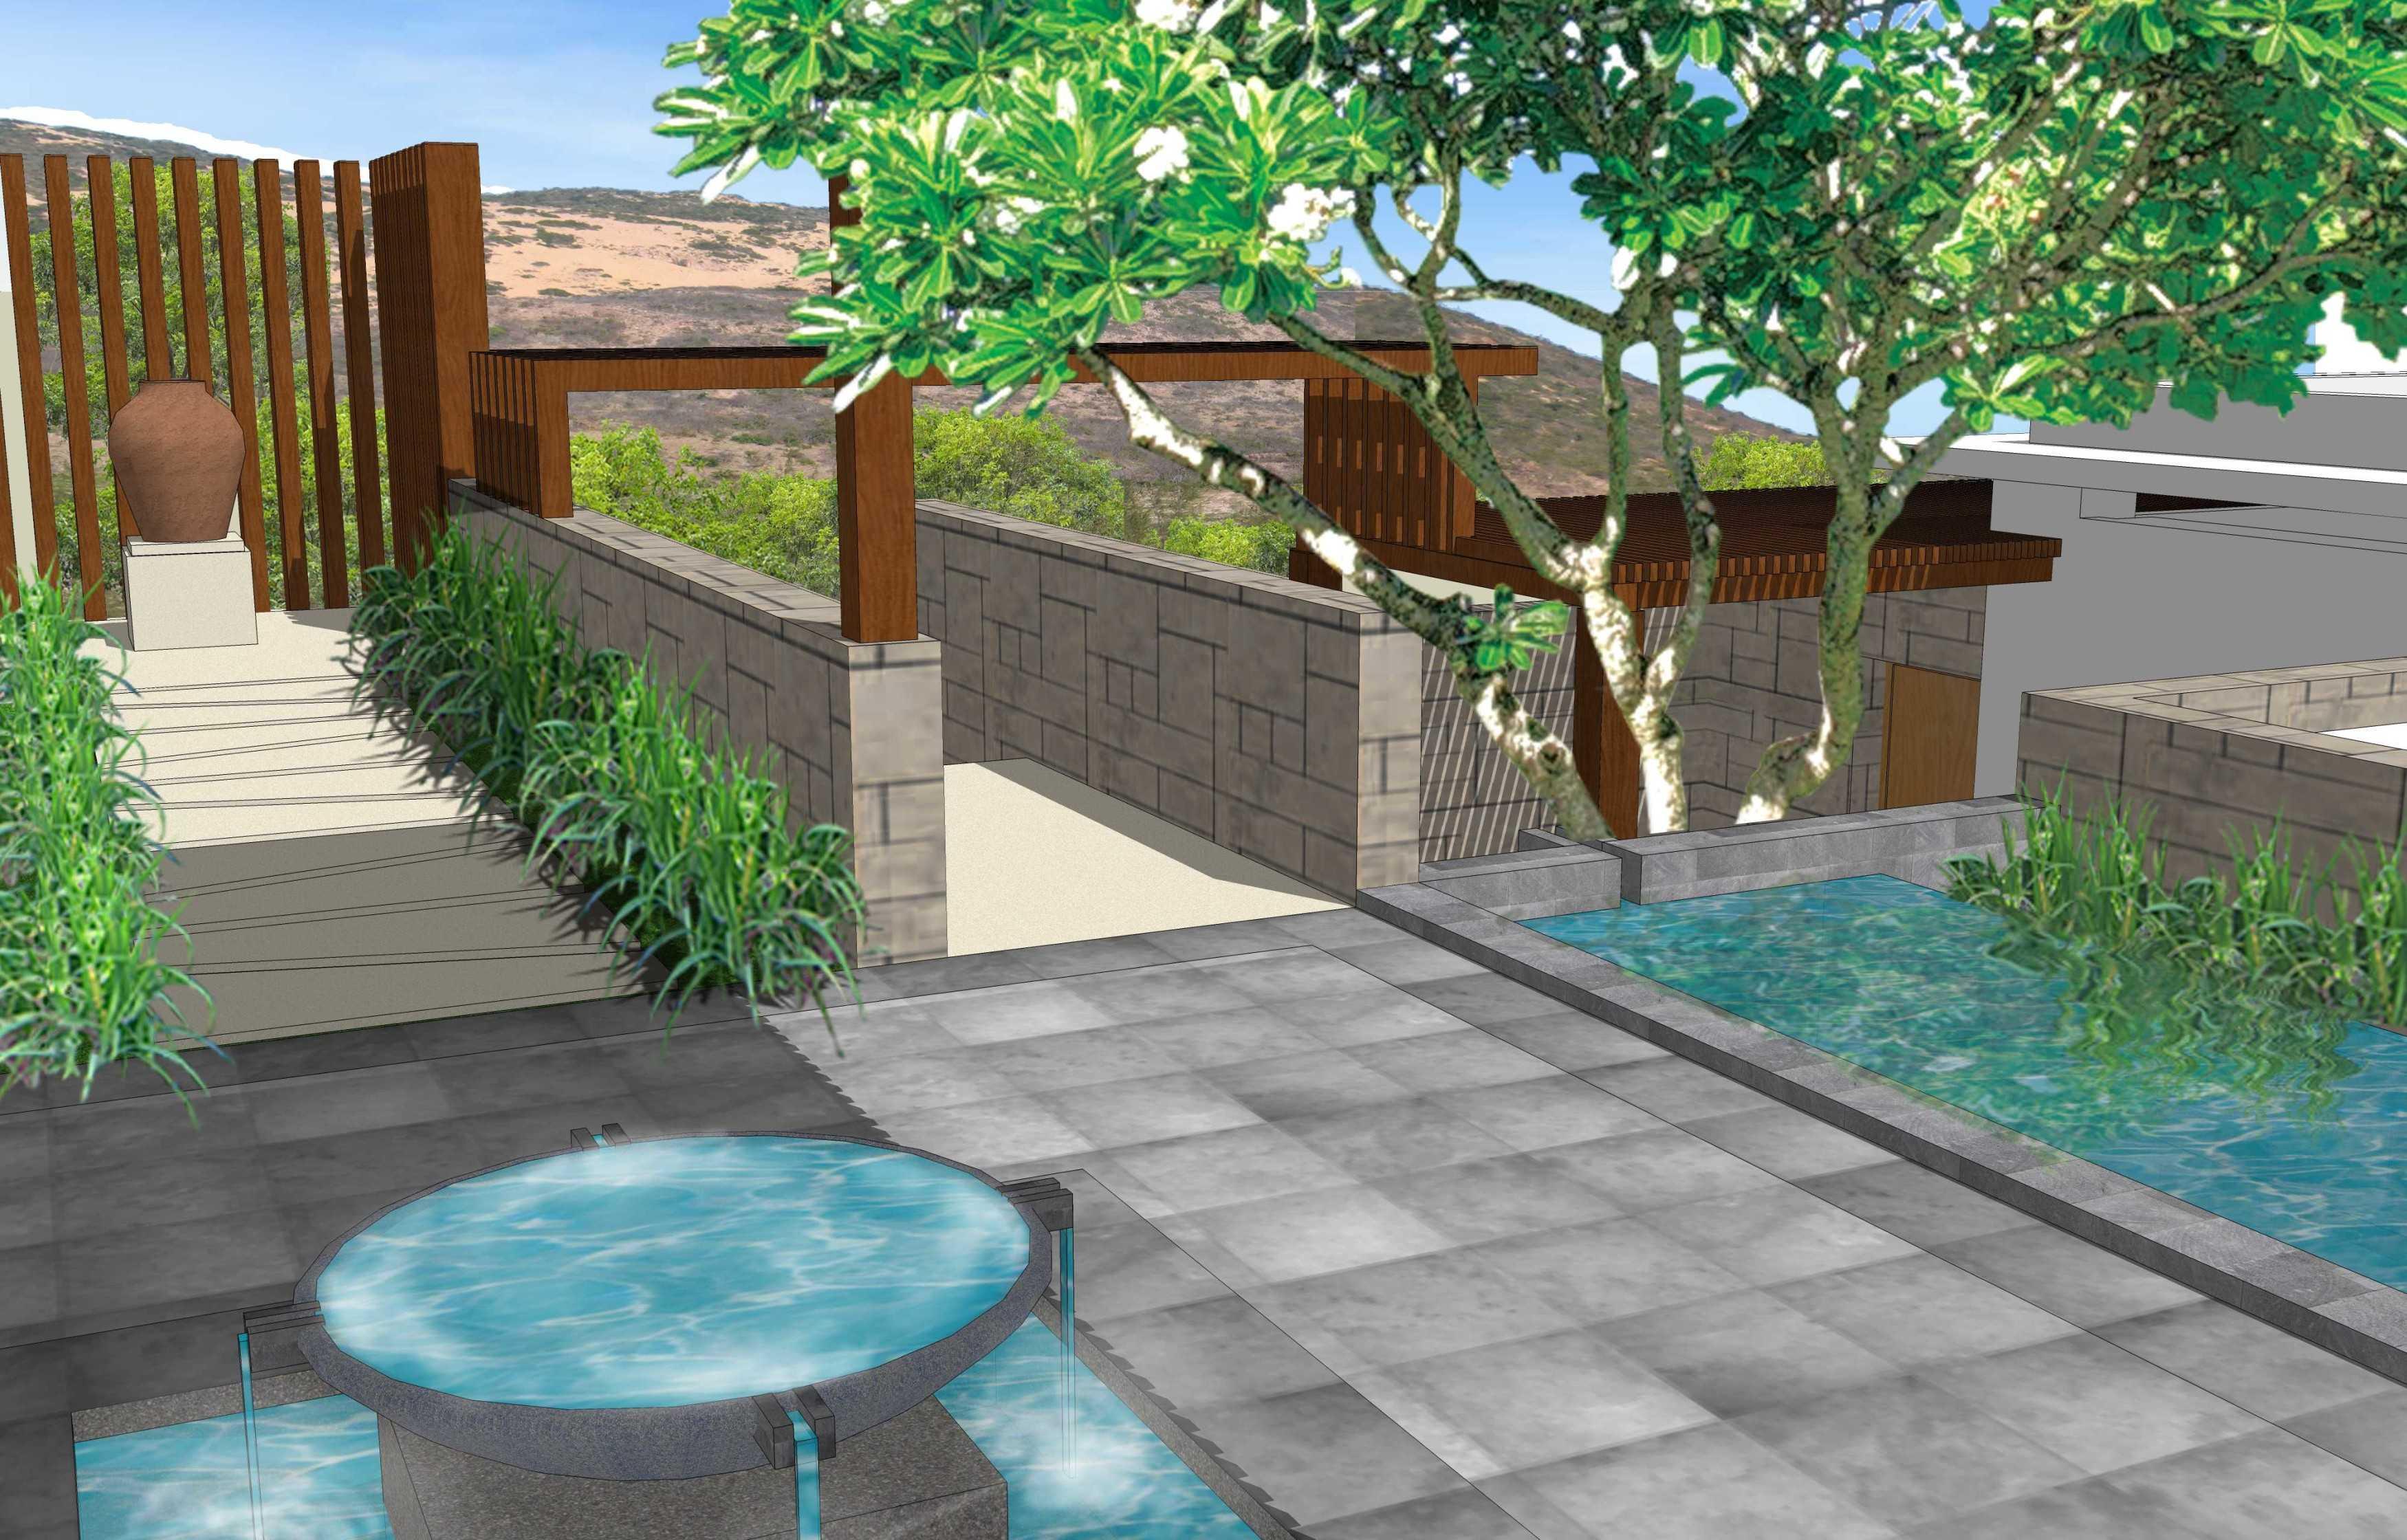 Adi Cipta Estetika Brastagi Resort And Spa Brastagi, North Sumatera Brastagi, North Sumatera Spa-View-2  Spa Unit 20306